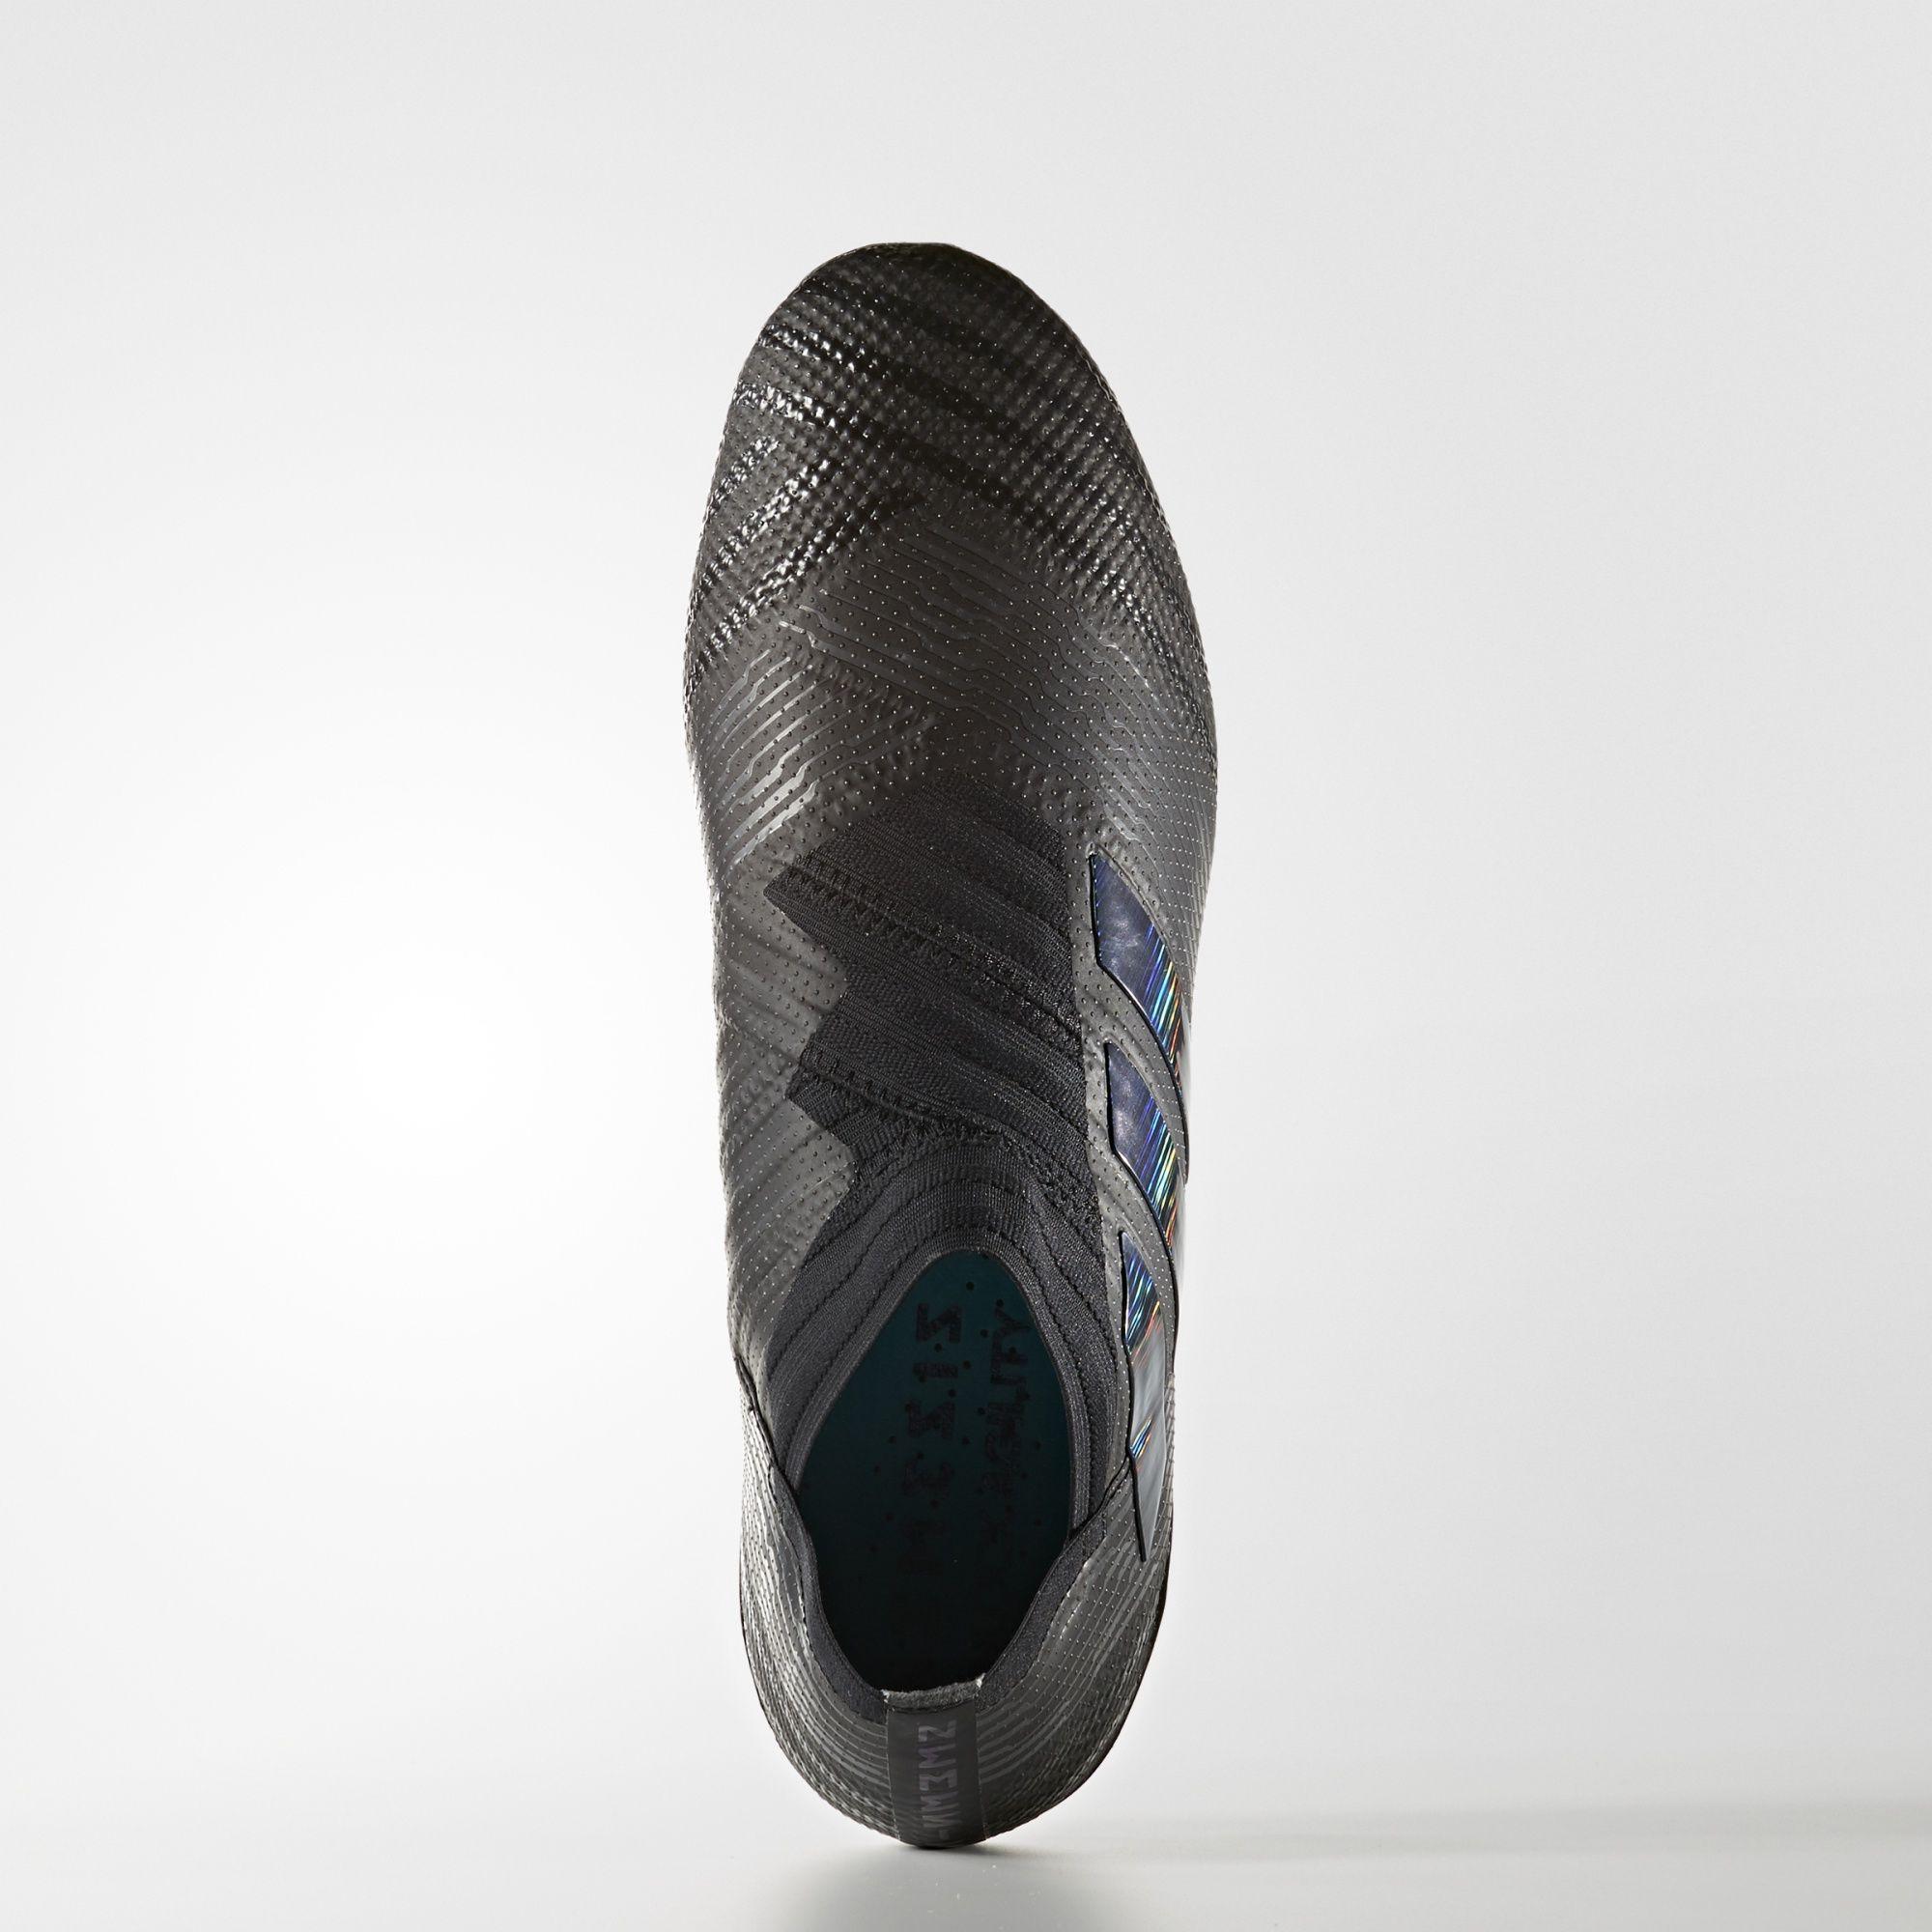 timeless design 23376 7a0cc Adidas Nemeziz 17+ 360 Agility Magnetic Storm - Core Black